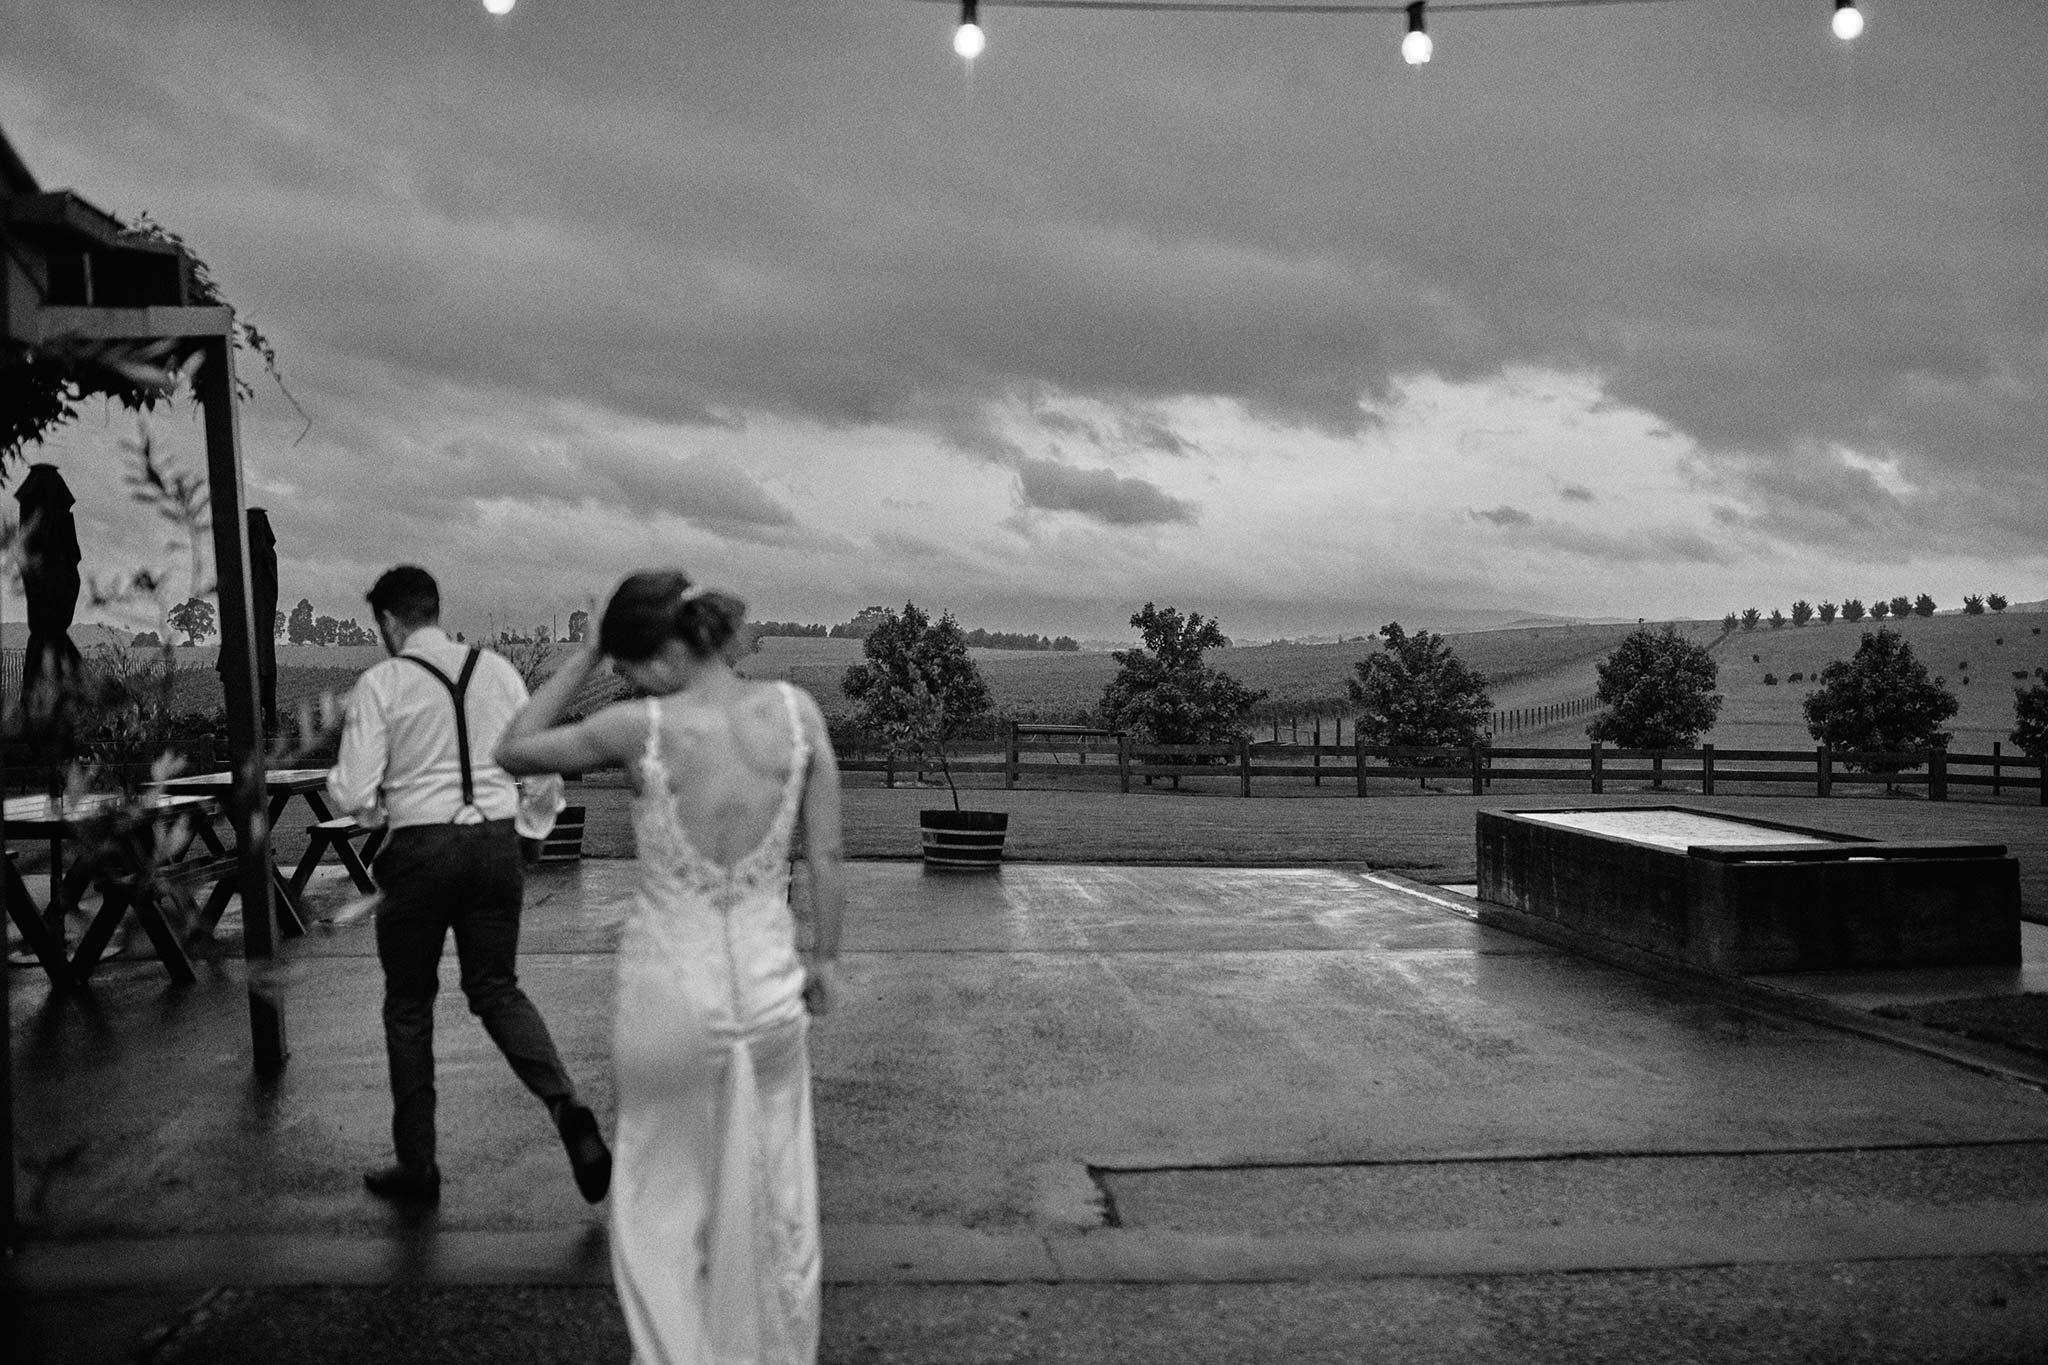 zonzo wedding photography reception entering reception